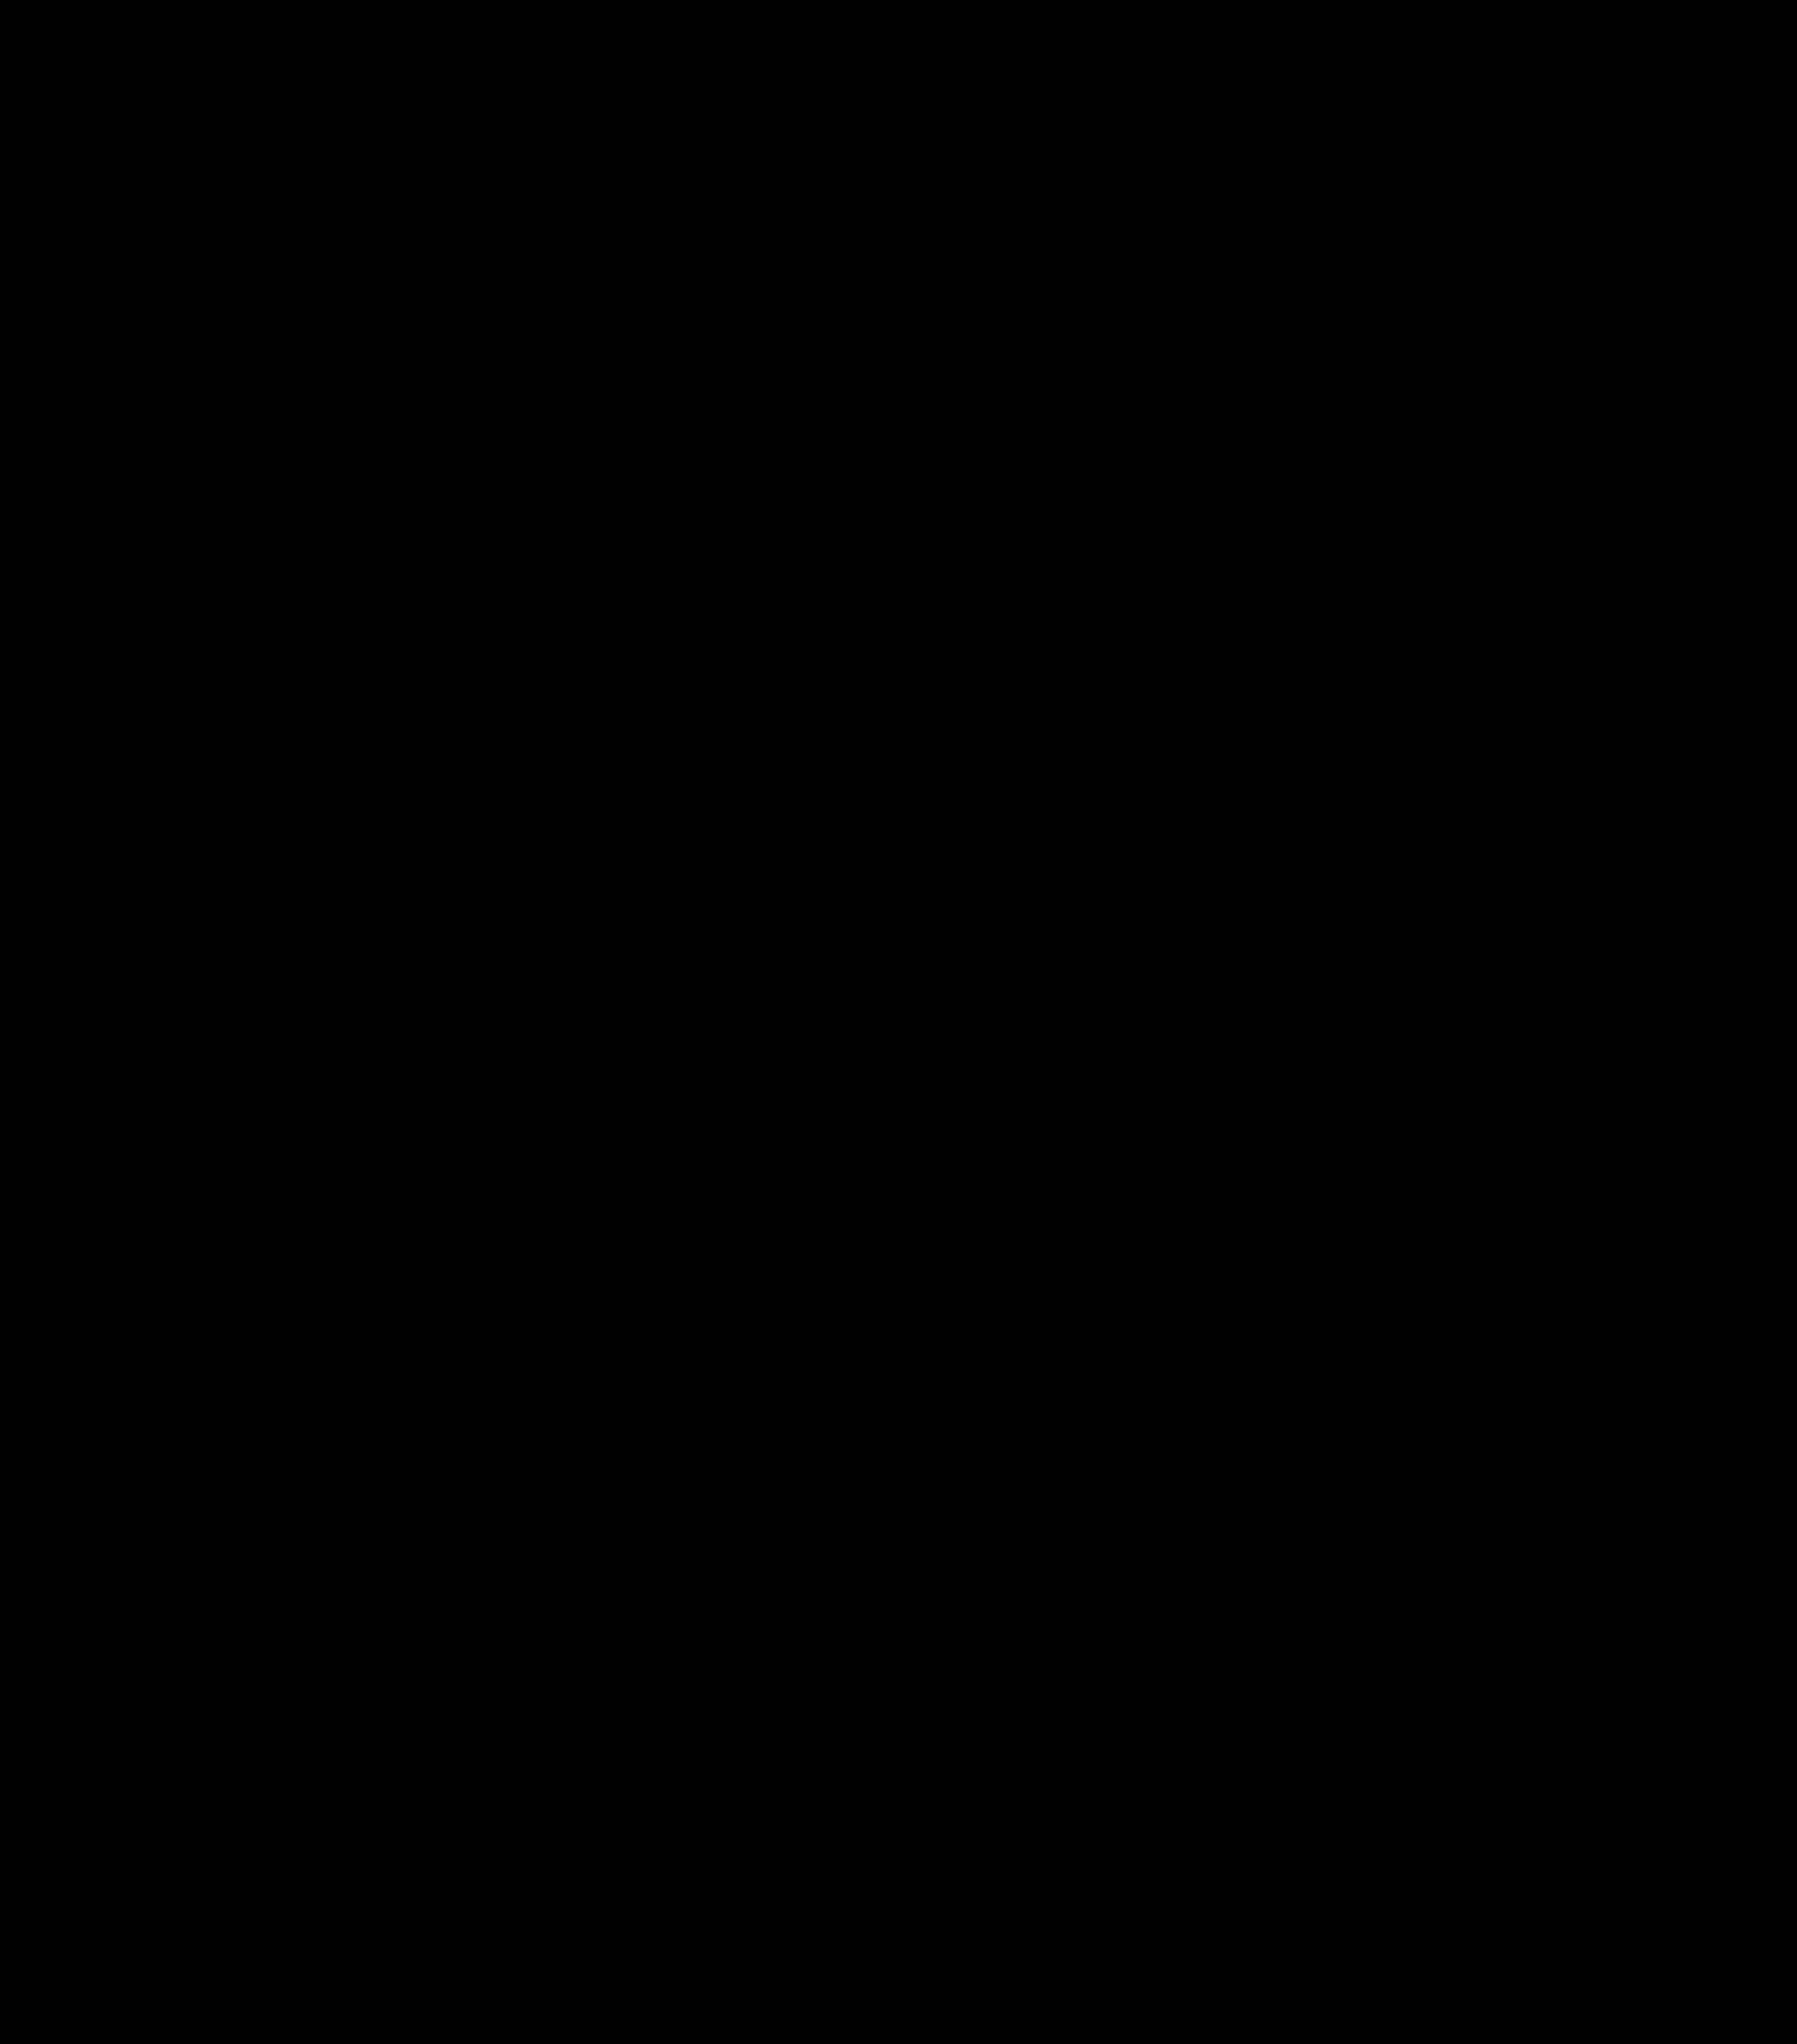 American woman female symbols. African clipart symbol